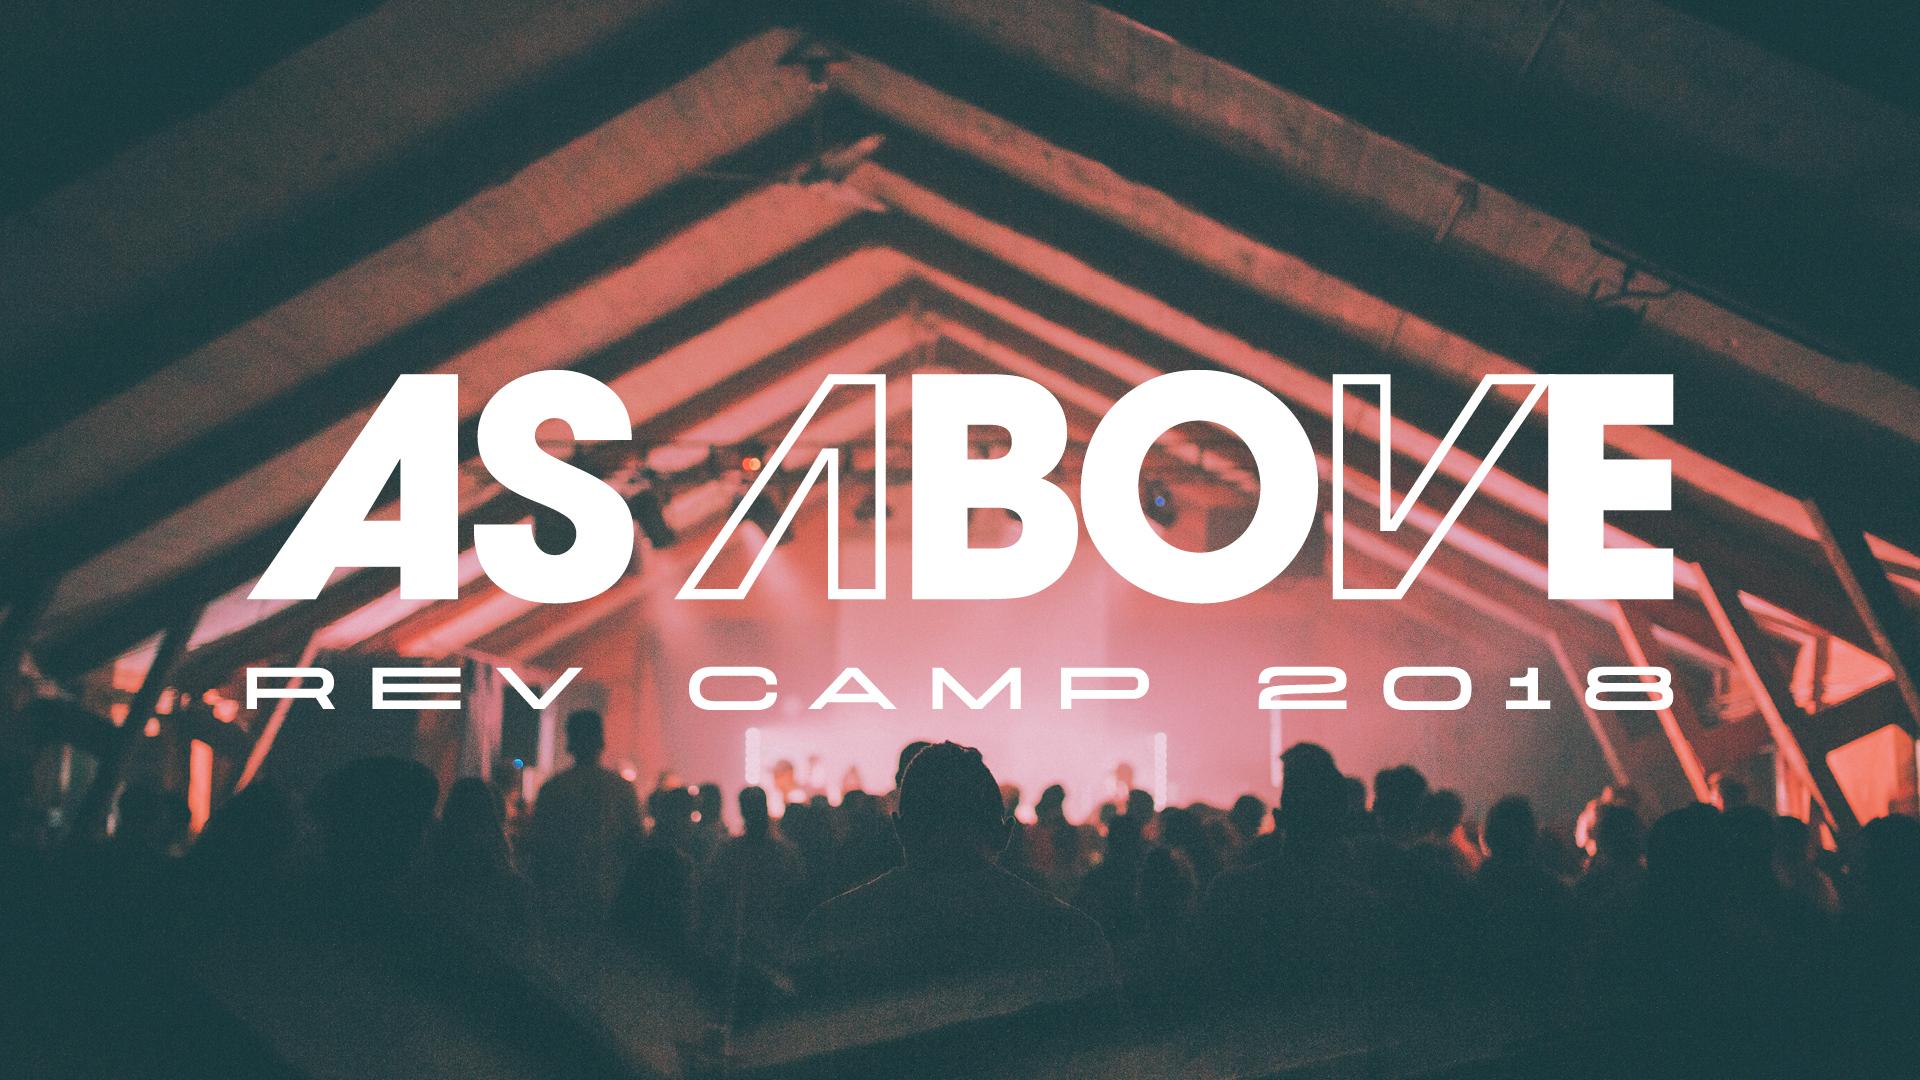 Rev Camp 2018 As Above Generic Slides.jpg